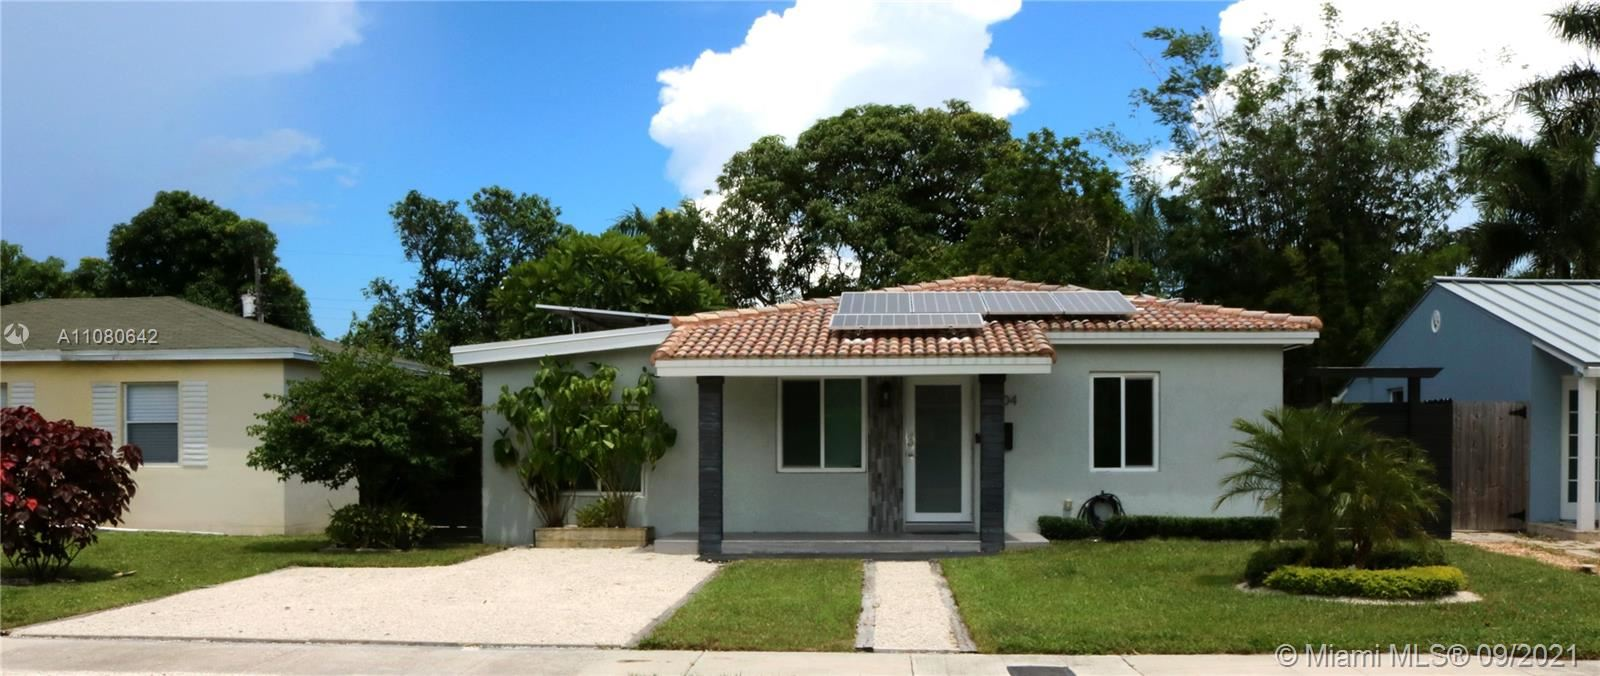 1404 NE 1st Ave, Fort Lauderdale, FL 33304 - #: A11080642